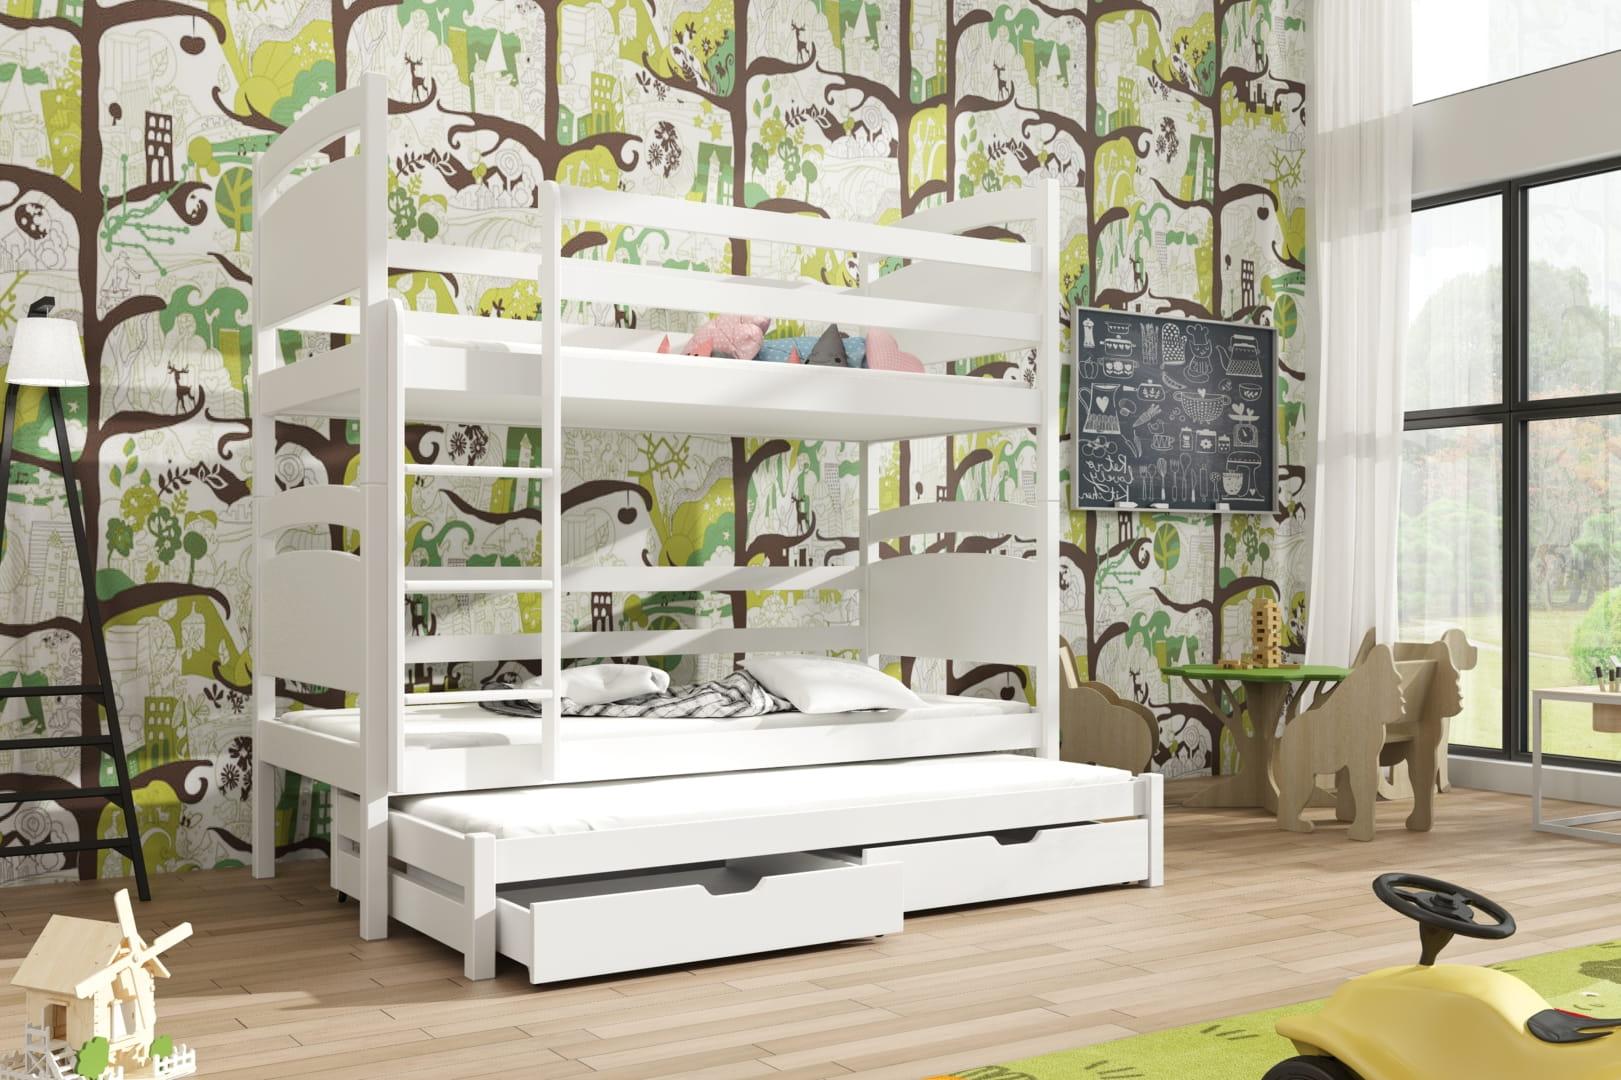 etagenbett fido ii etagenbett kinder etagenbett f r 3 personen. Black Bedroom Furniture Sets. Home Design Ideas